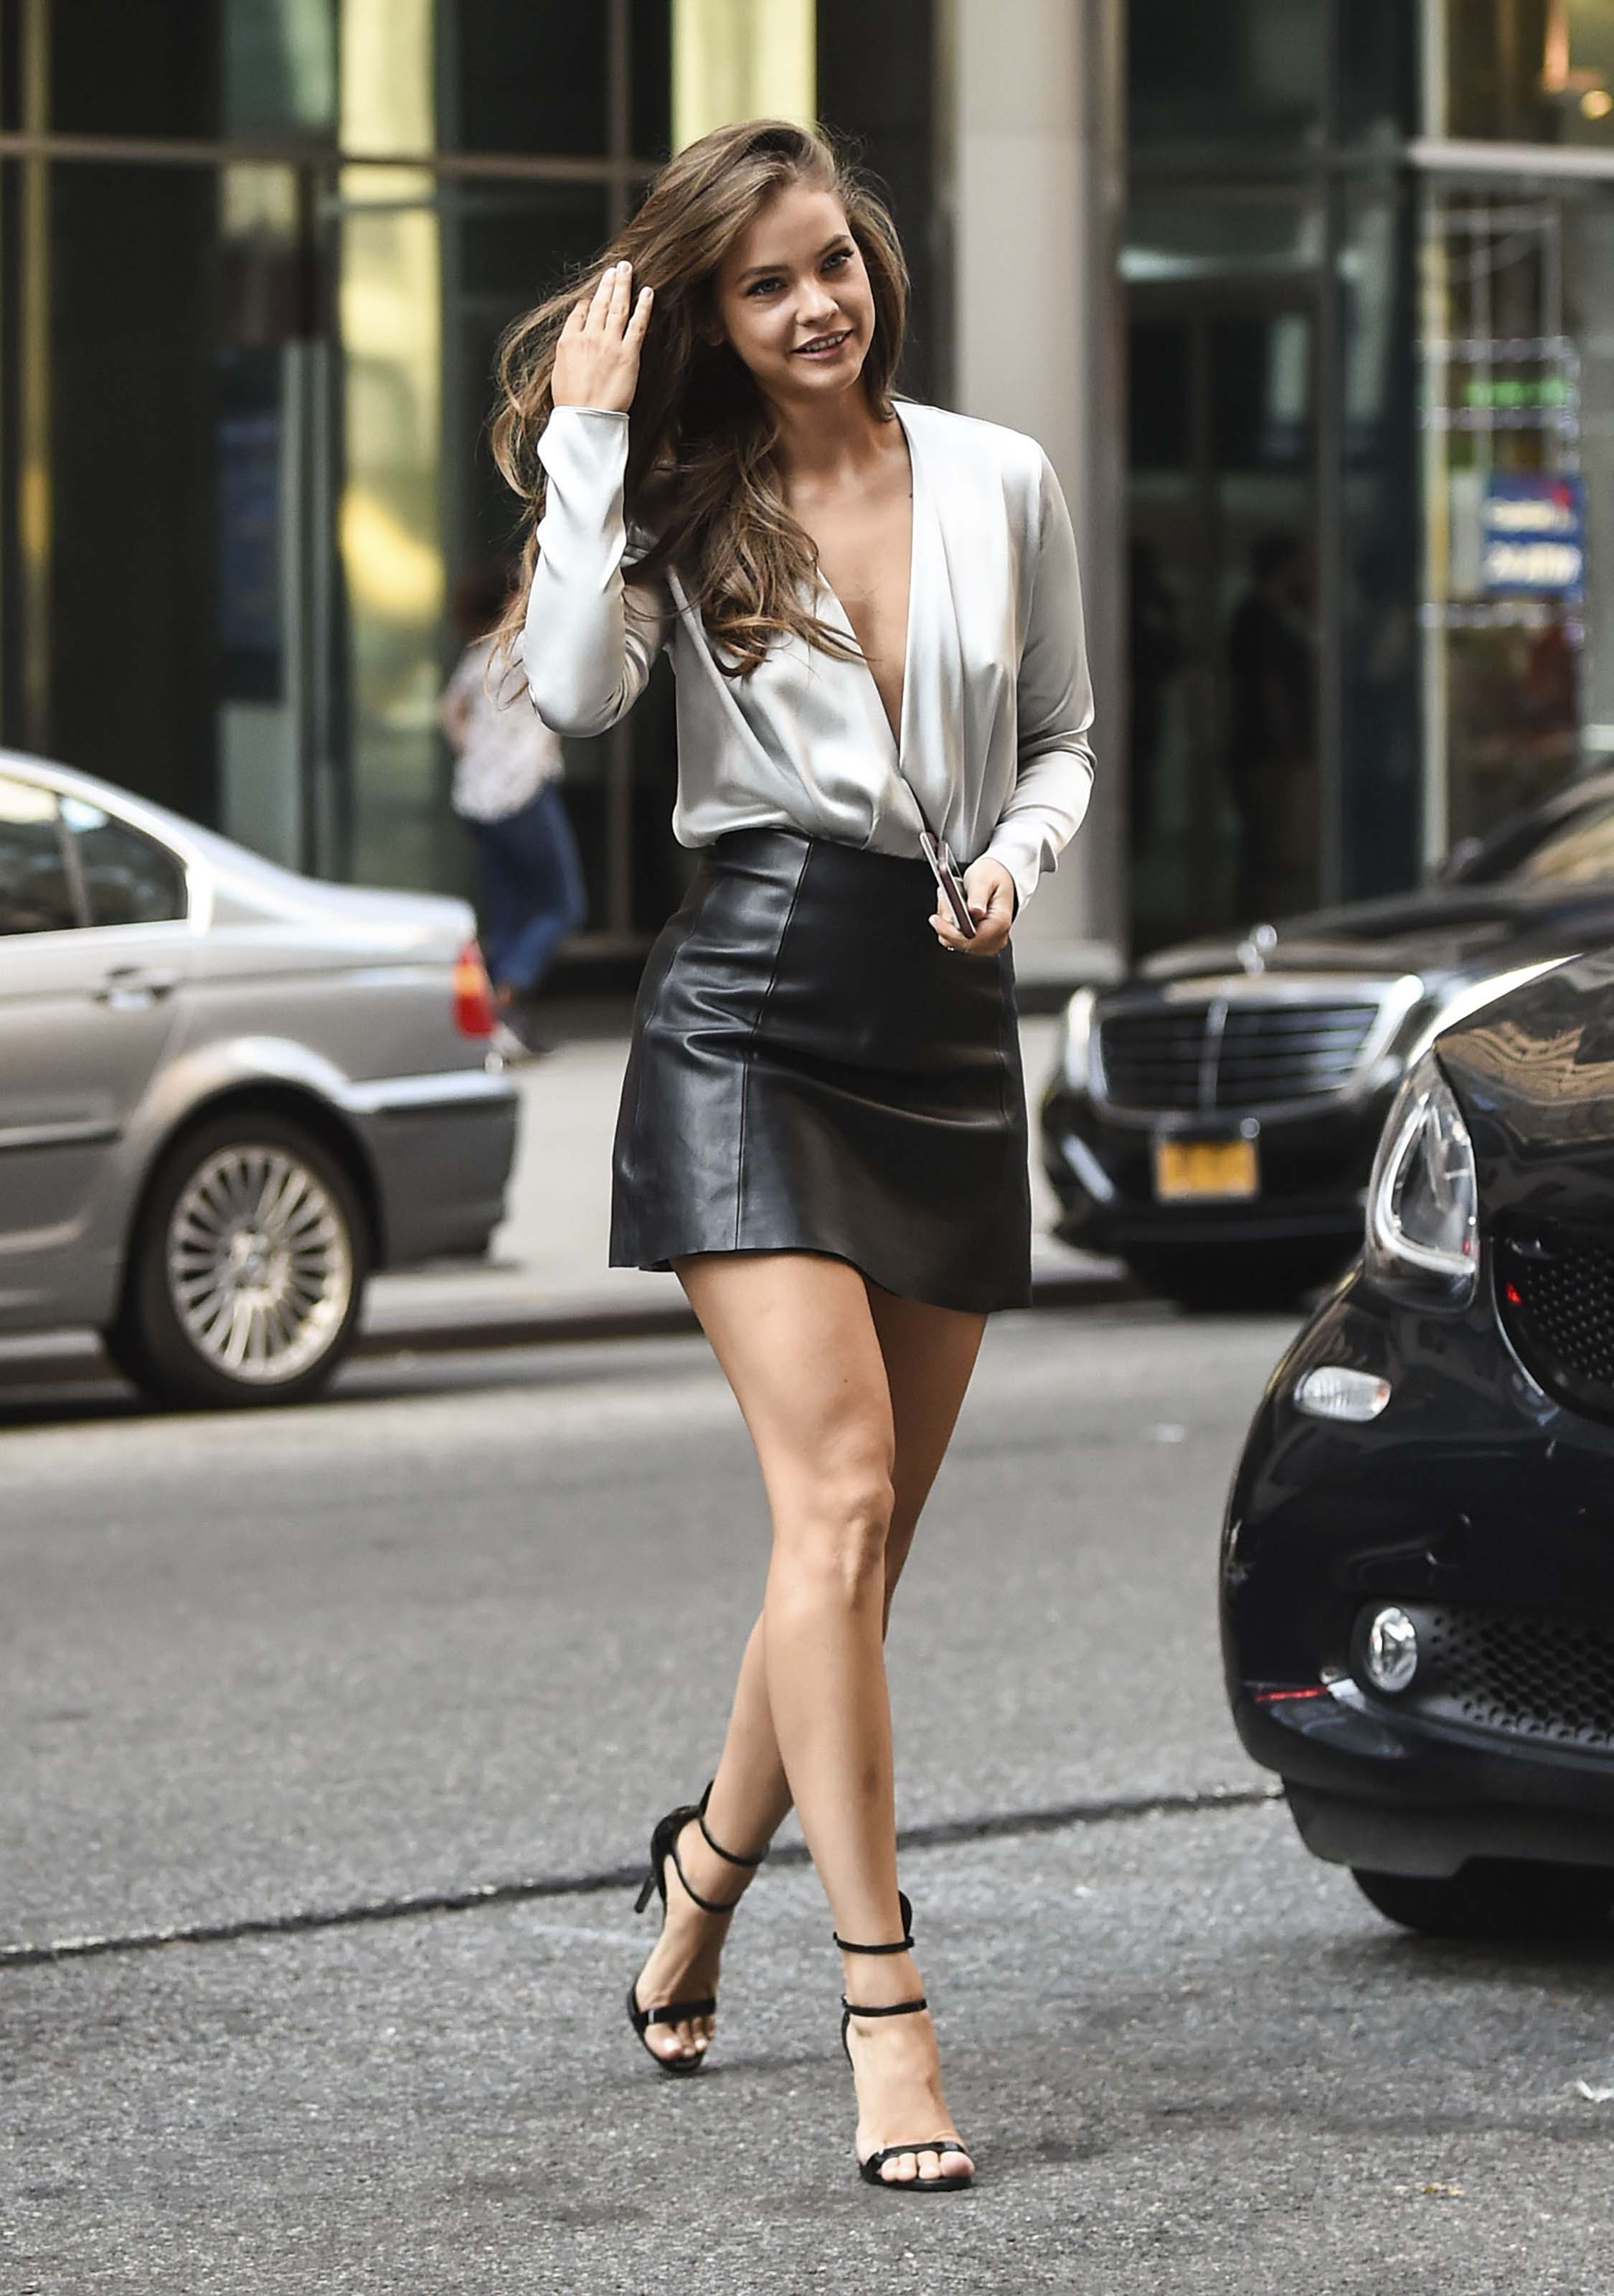 Barbara Palvin at Victoria's Secret headquarters